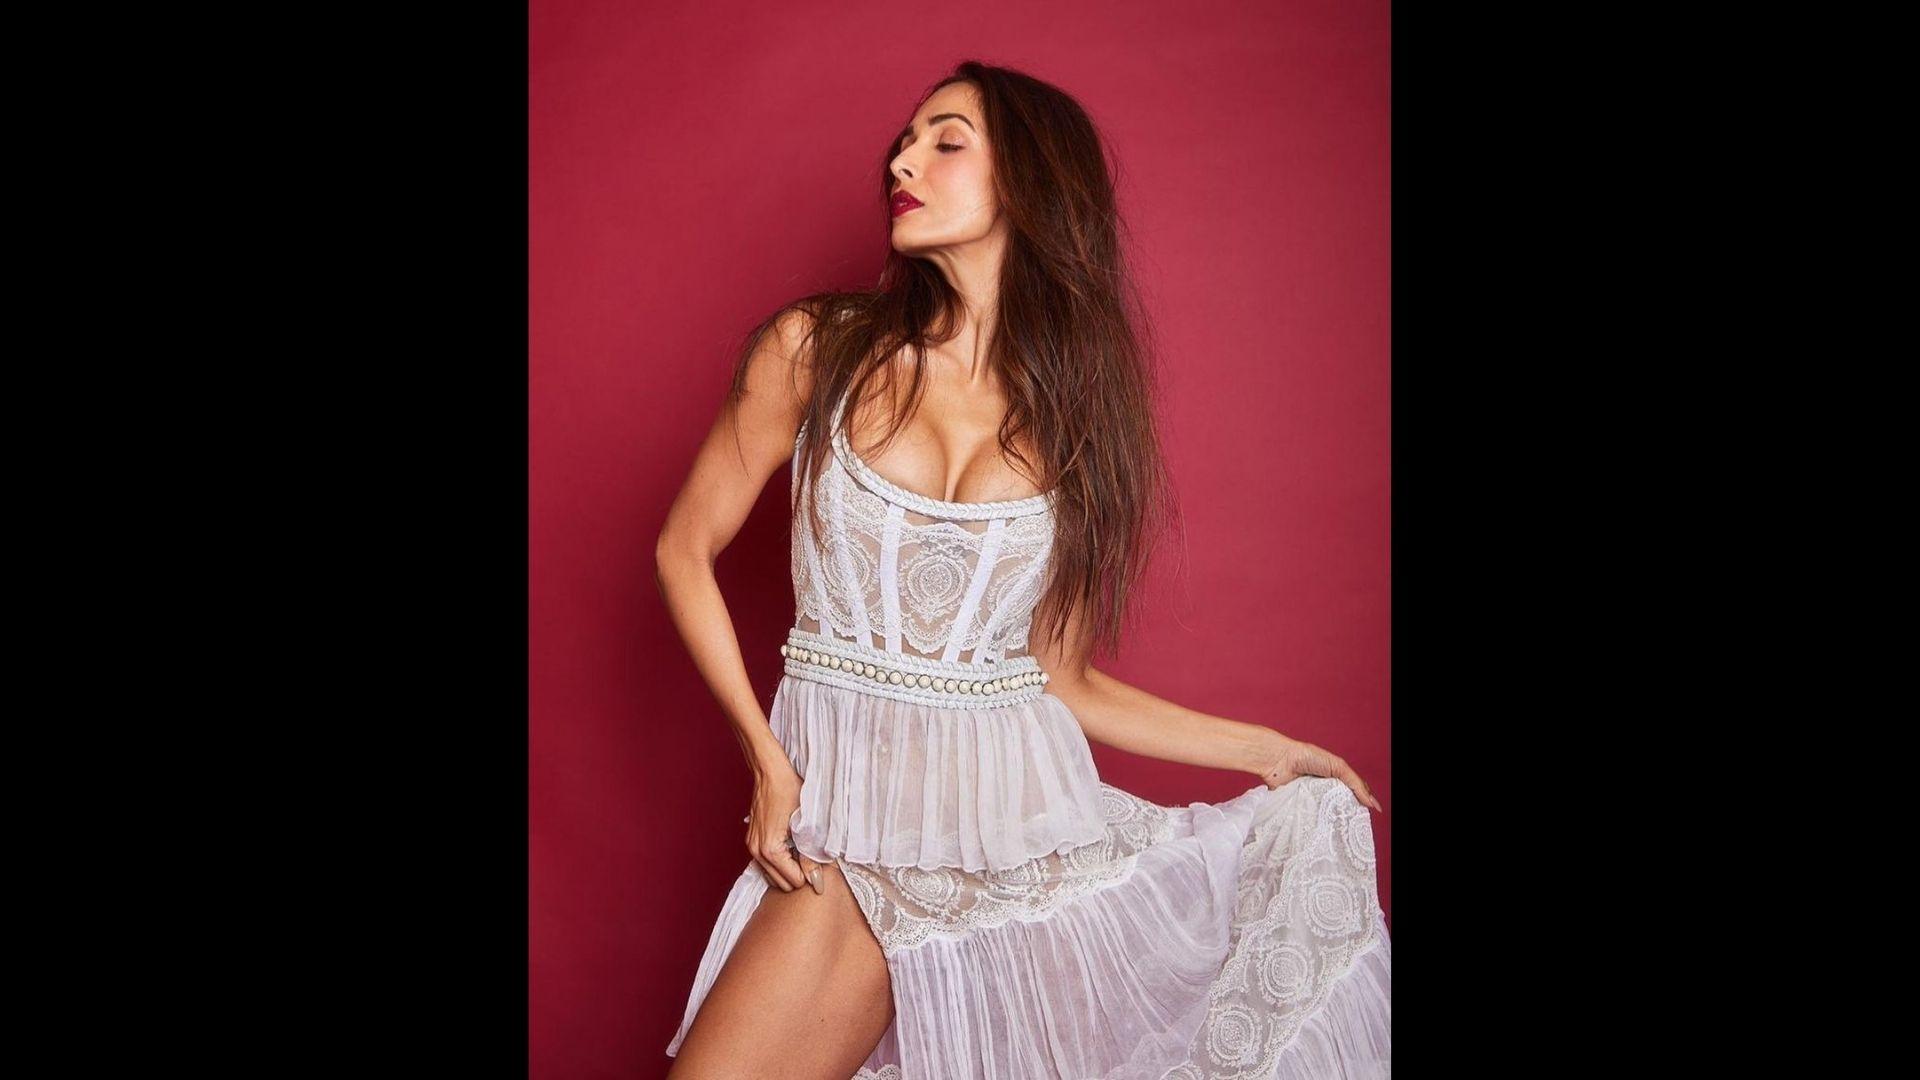 Daring Outfits Worn By Malaika Arora That Prove She's A Fashion Goddess